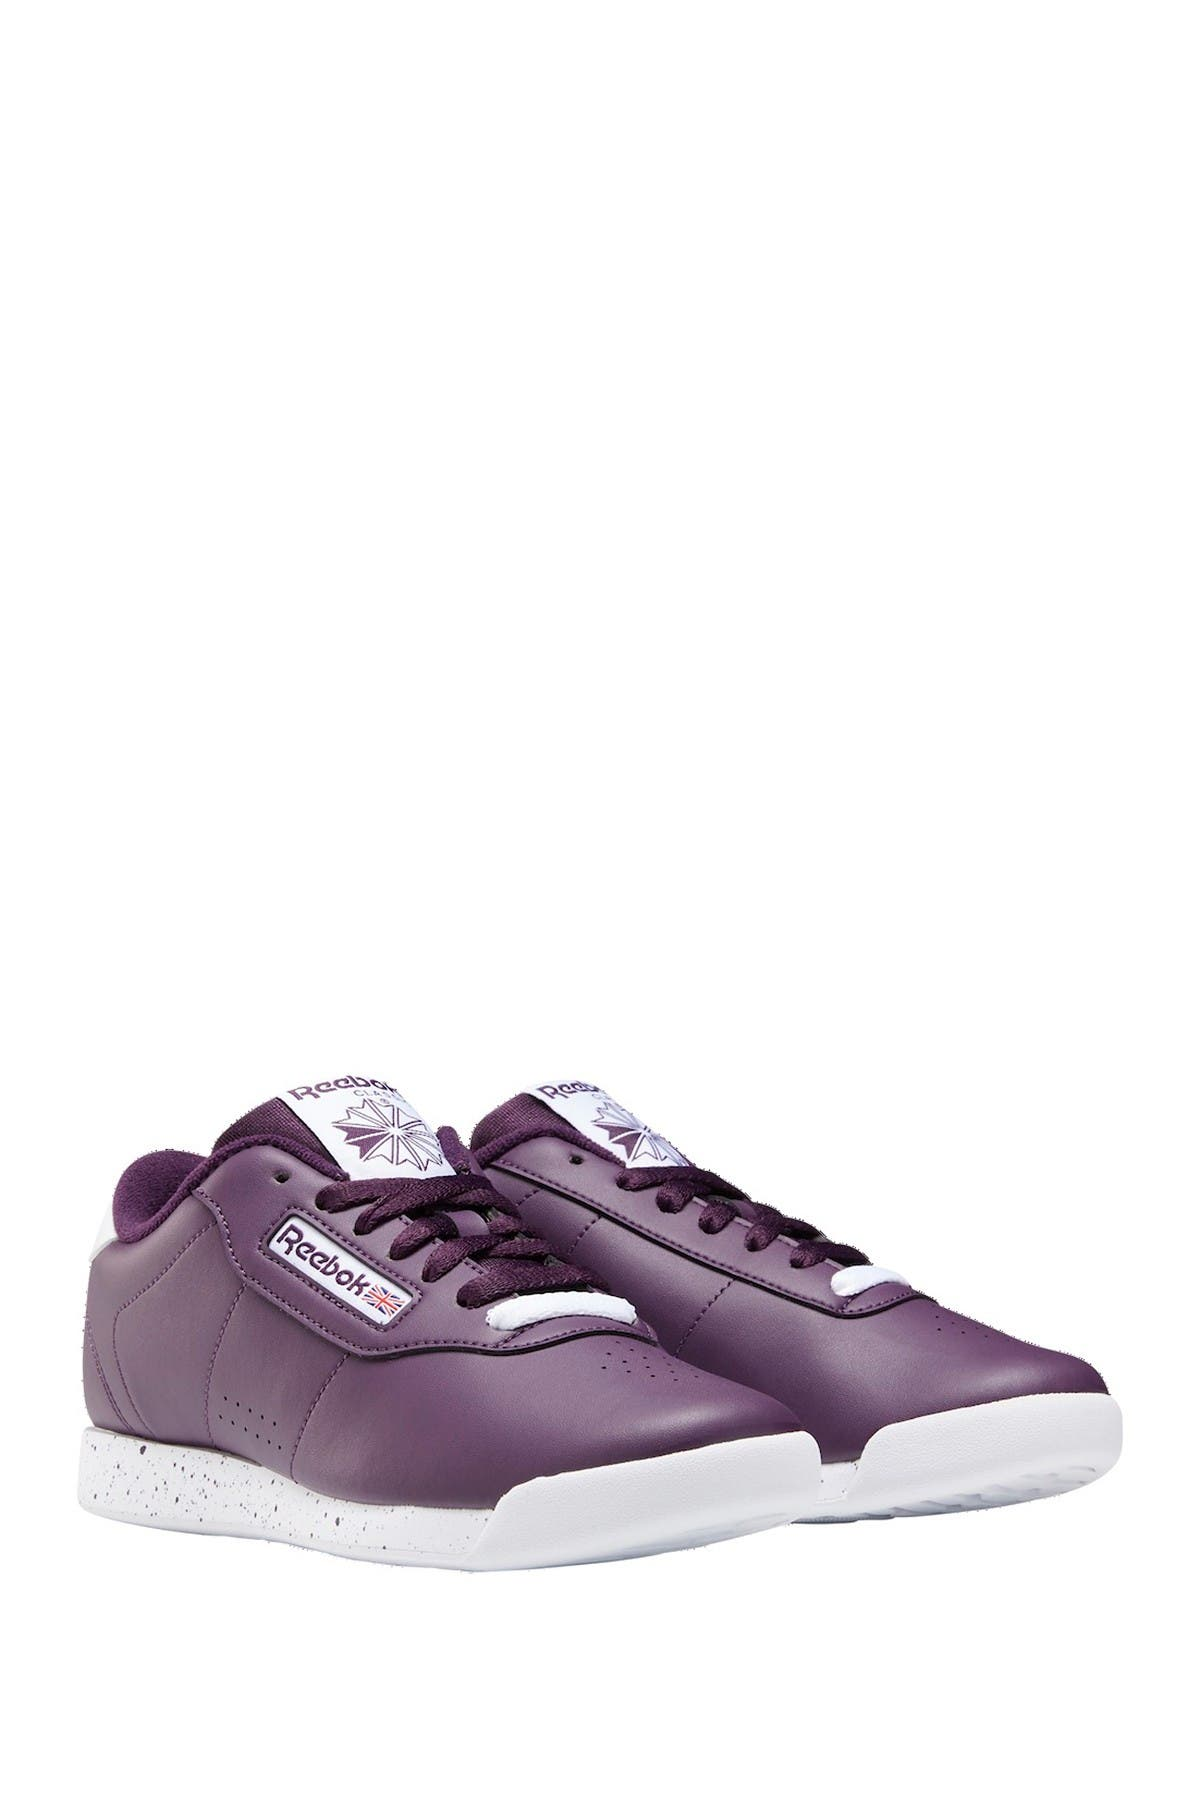 Image of Reebok Princess Lace-Up Sneaker